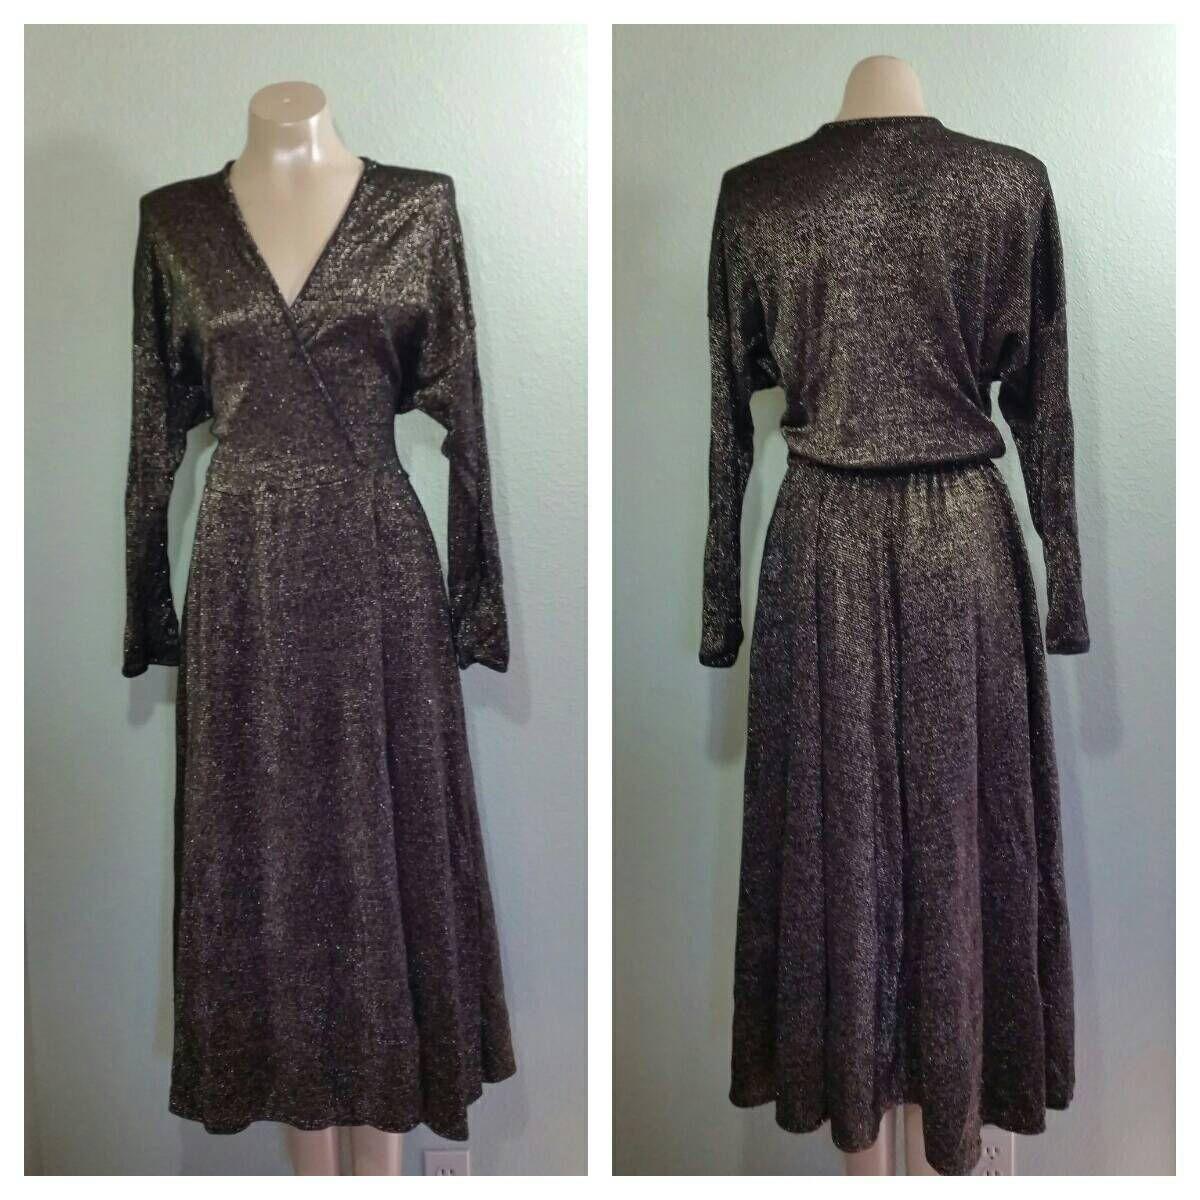 Vintage 70 S Maxi Dress Metallic Knit Wrap Dress By Etsy 70s Maxi Dress Knit Wrap Dress Metallic Knits [ 1200 x 1200 Pixel ]